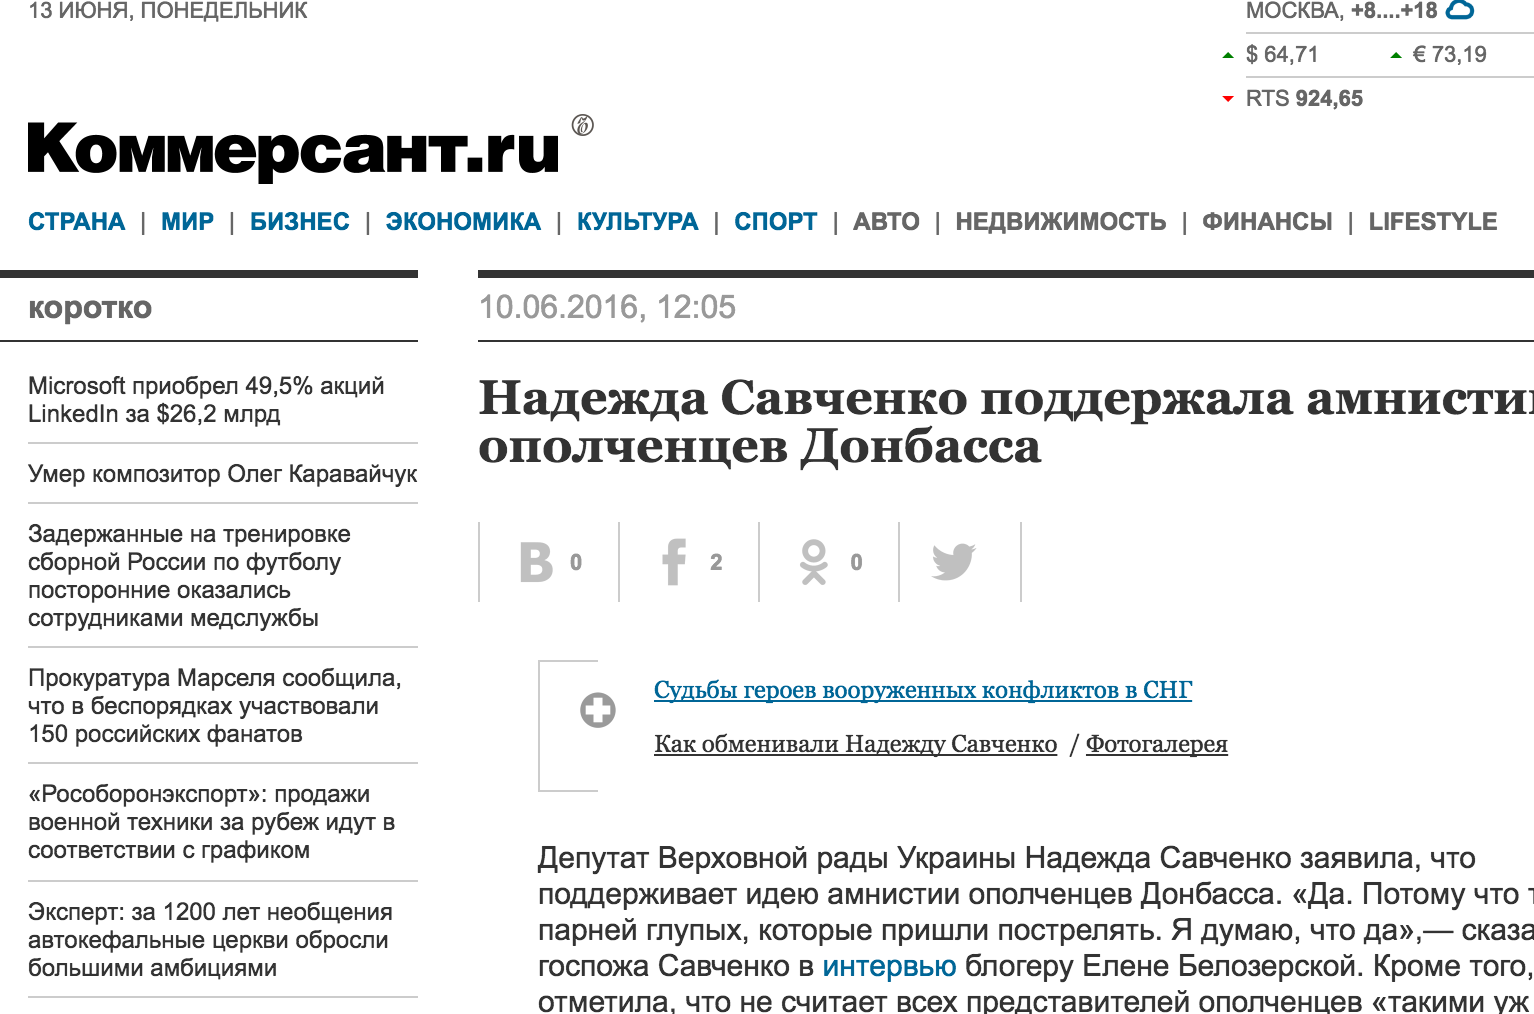 Website screenshot Kommersant